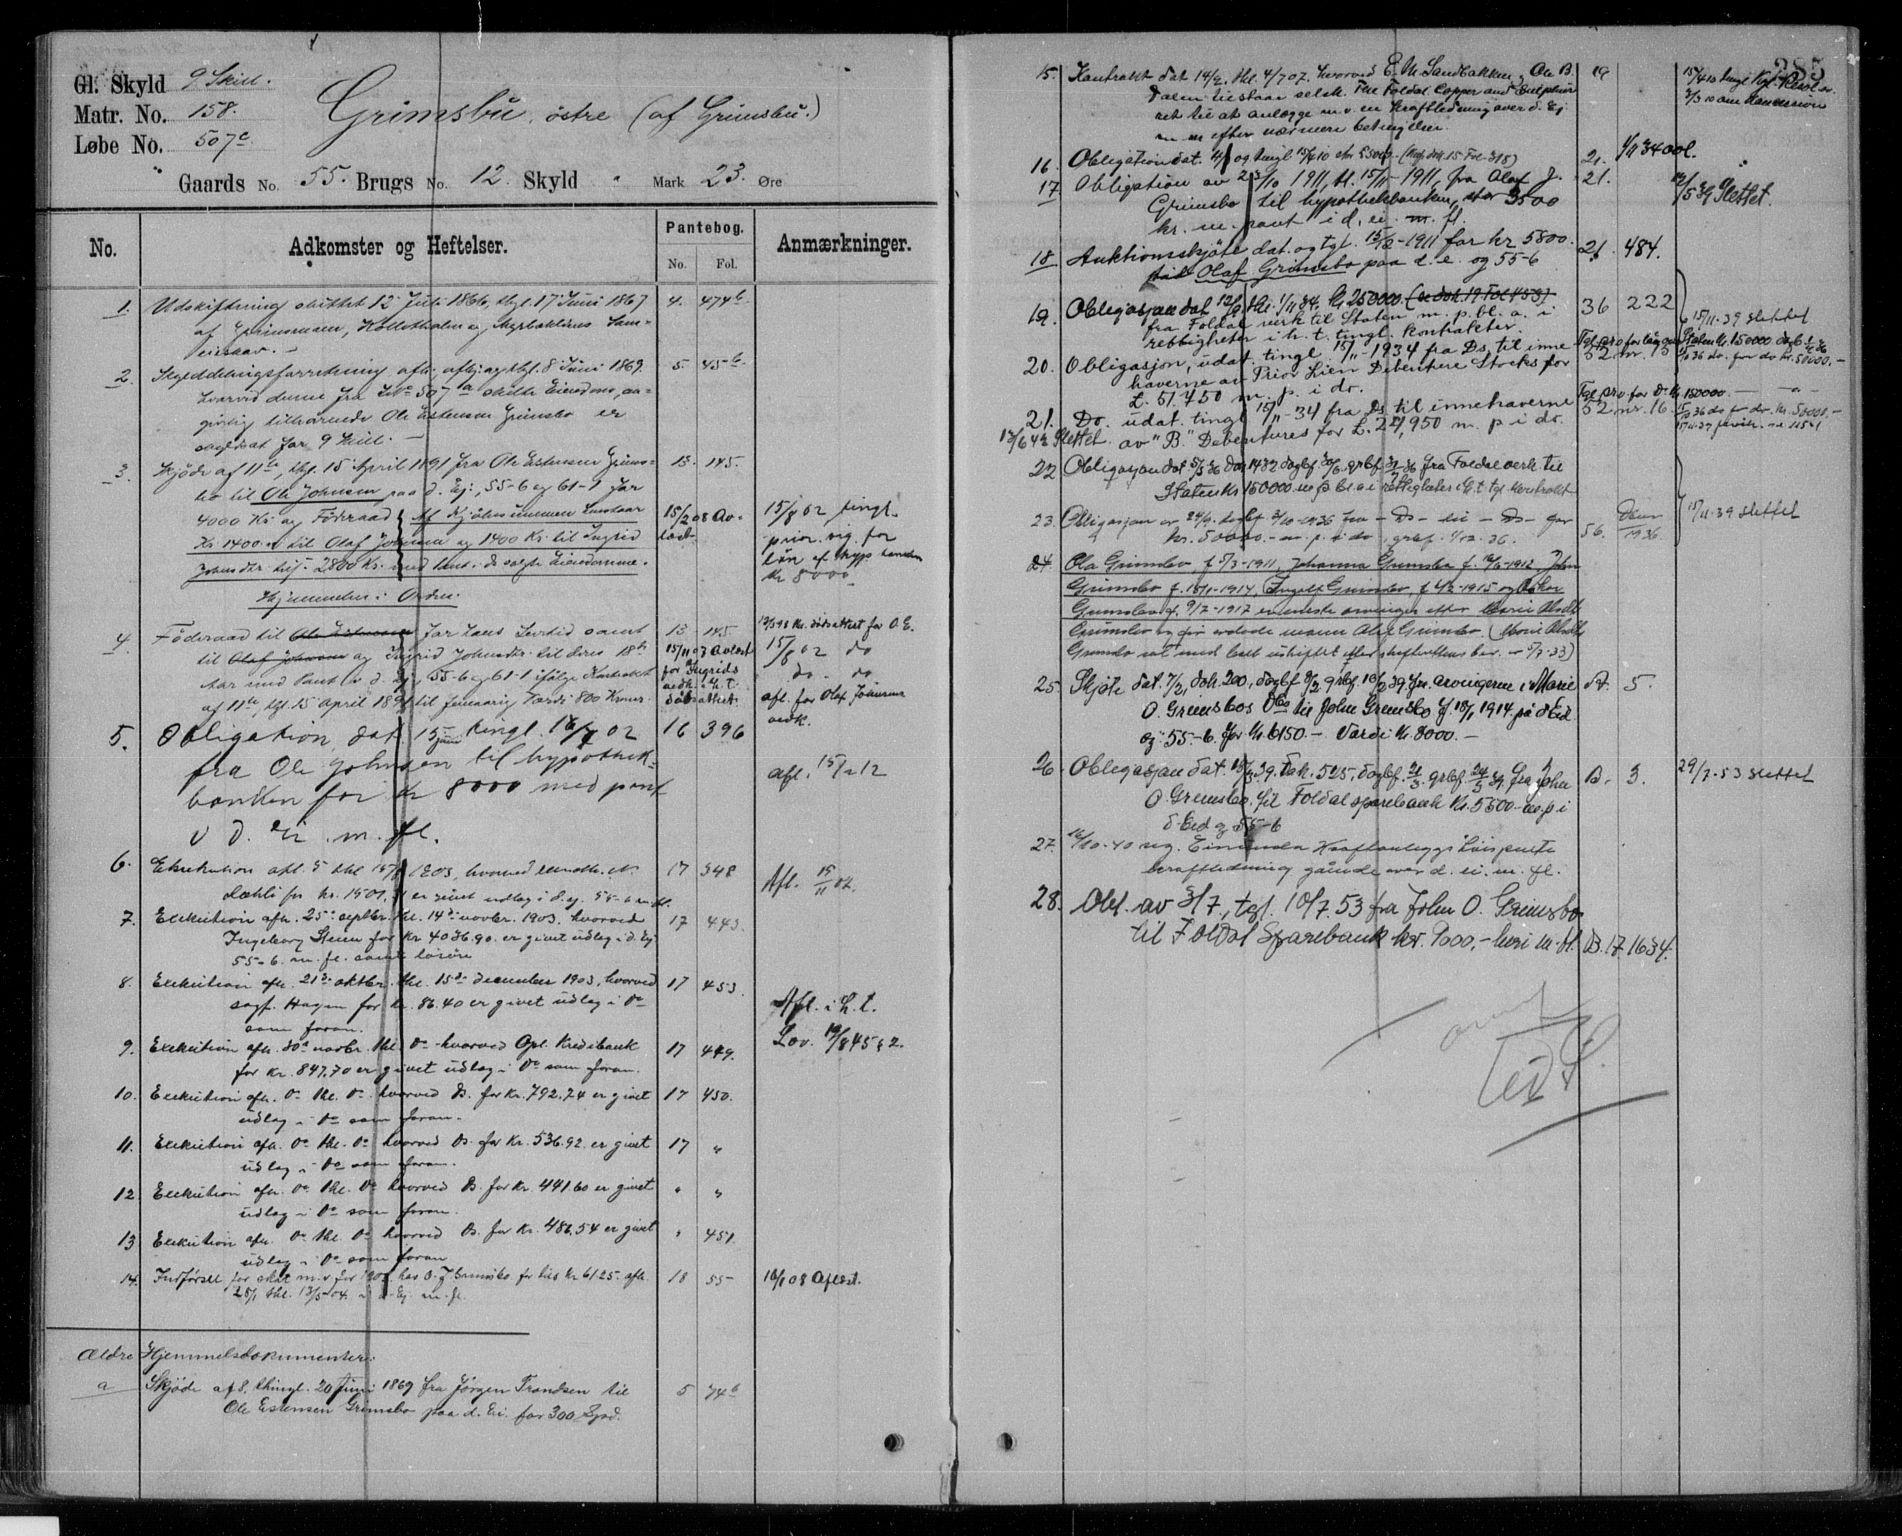 SAH, Nord-Østerdal tingrett, H/Ha/Haf/L0033: Mortgage register no. 3B, 1895, p. 285